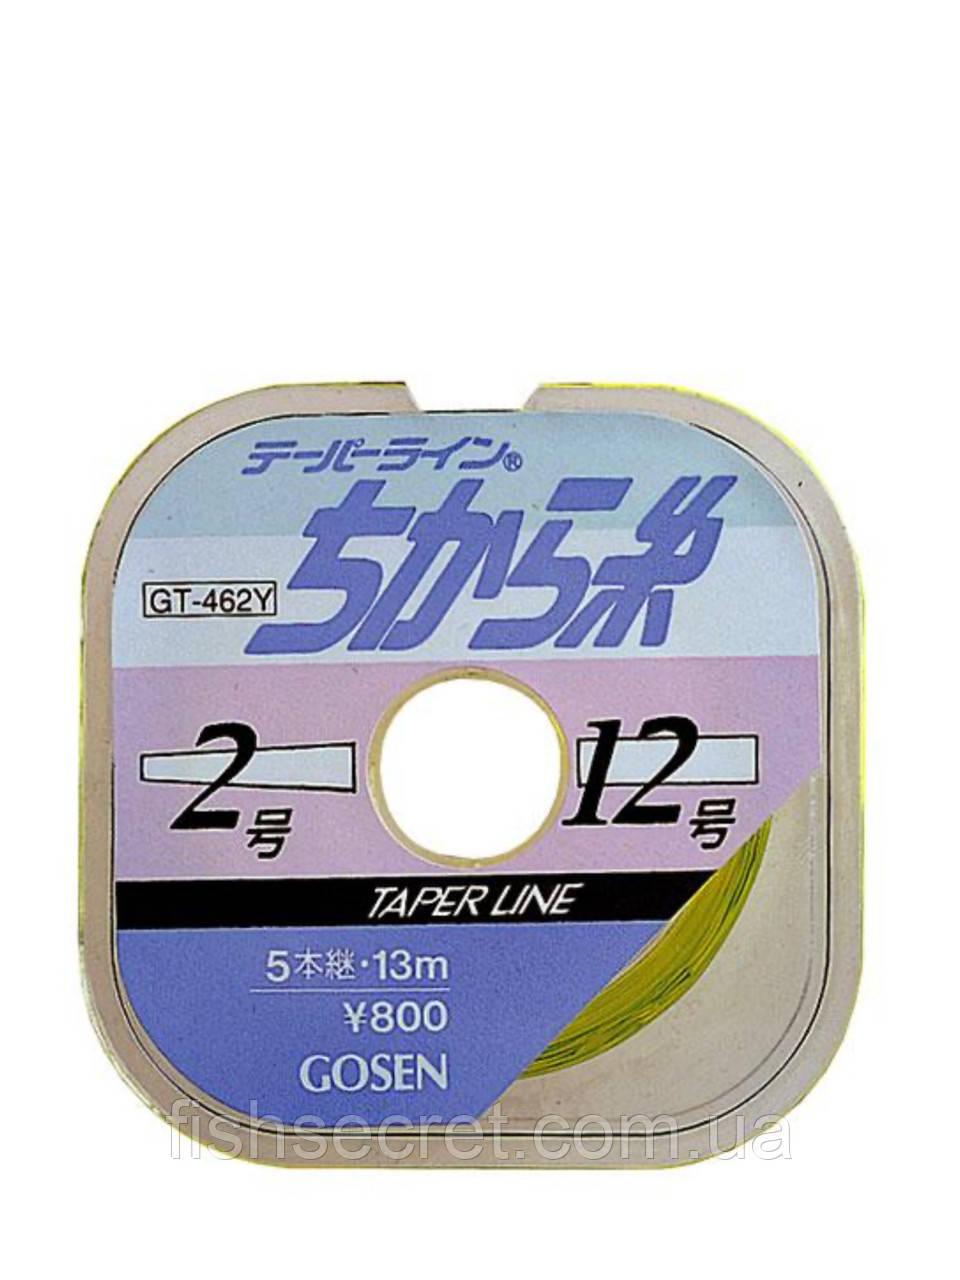 Шок лидер Gosen Taper Line GT-462N 15м*5шт